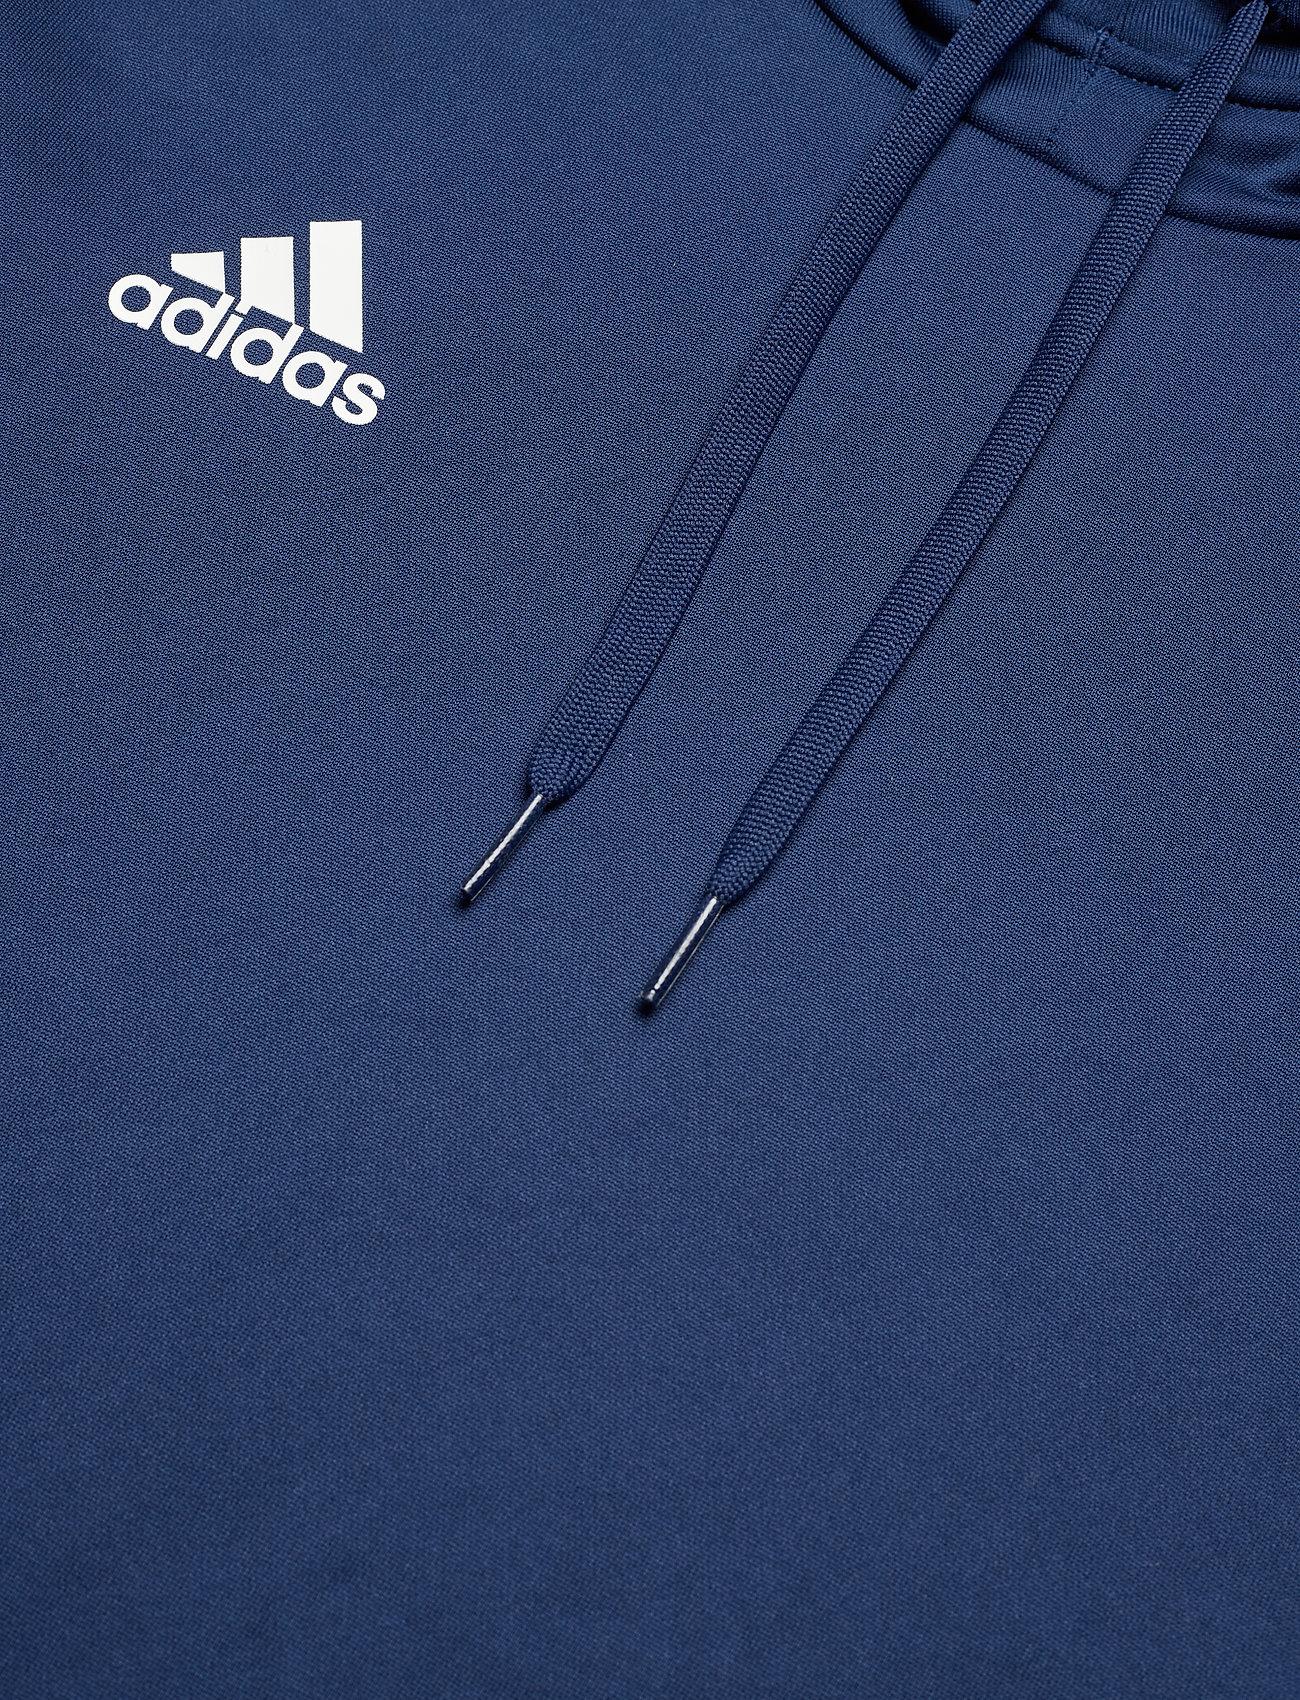 Hoody MnavyAdidas MnavyAdidas Tennis Hoody T19 Tennis T19 Tennis MnavyAdidas T19 Hoody 34A5RLj